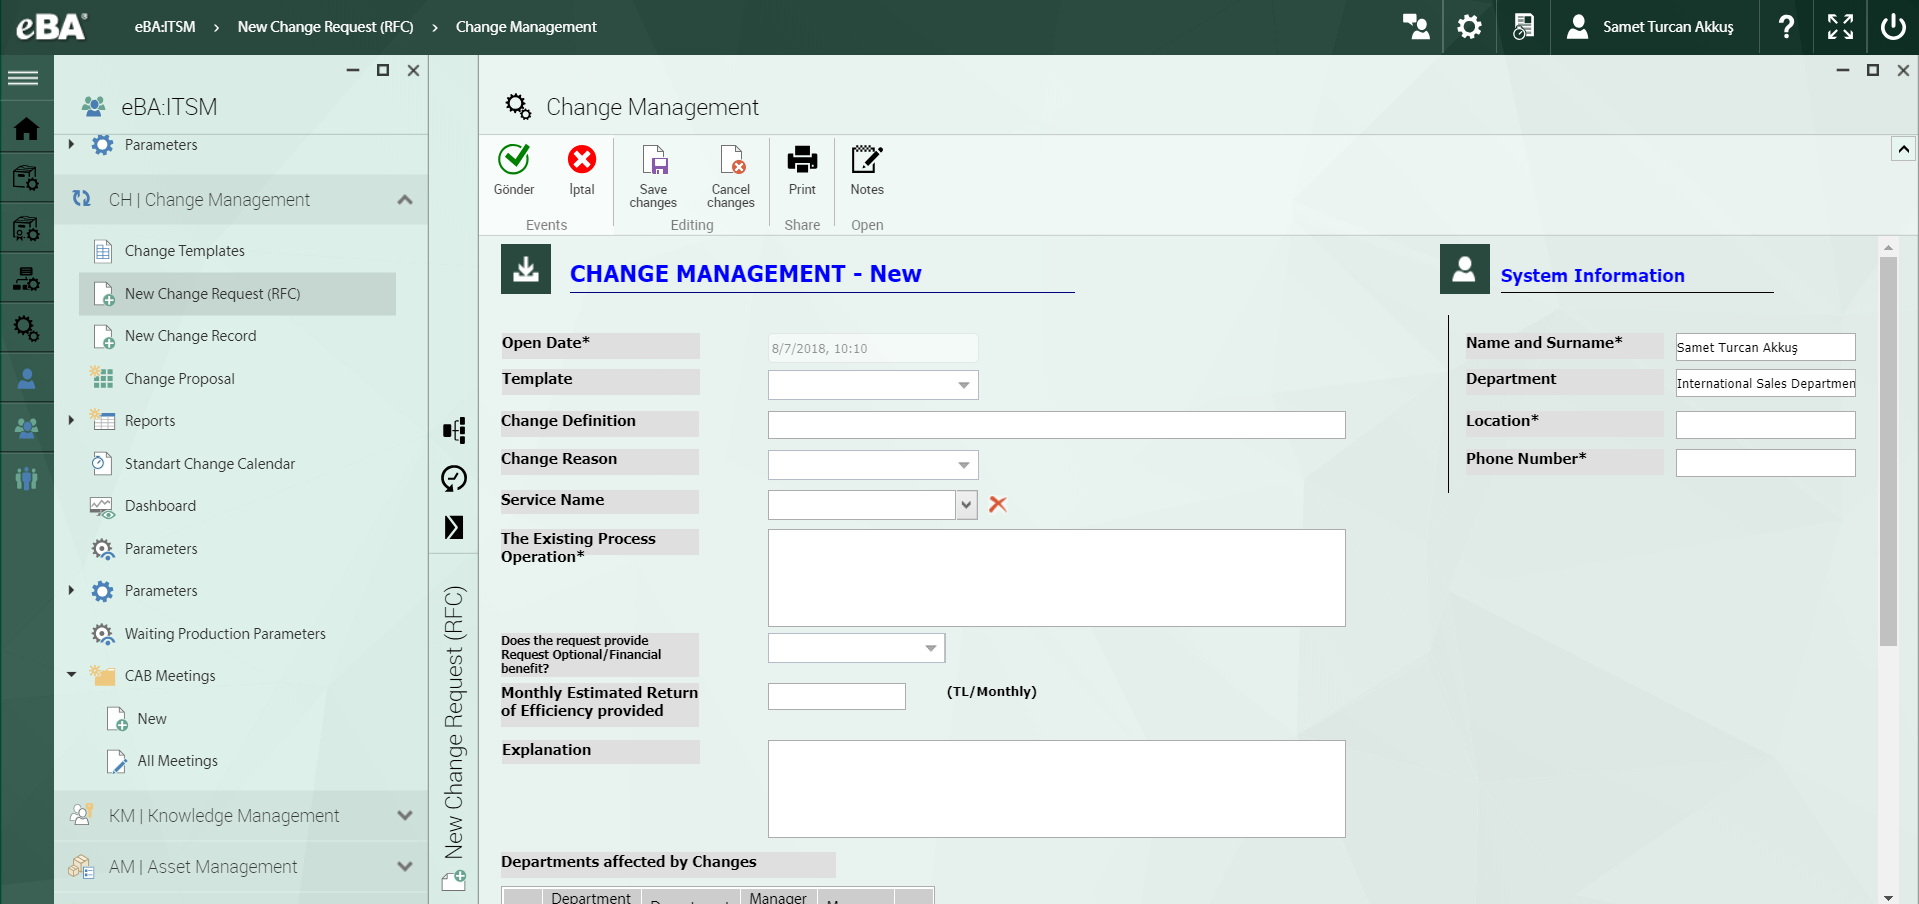 eBA ITSM Software - Change management